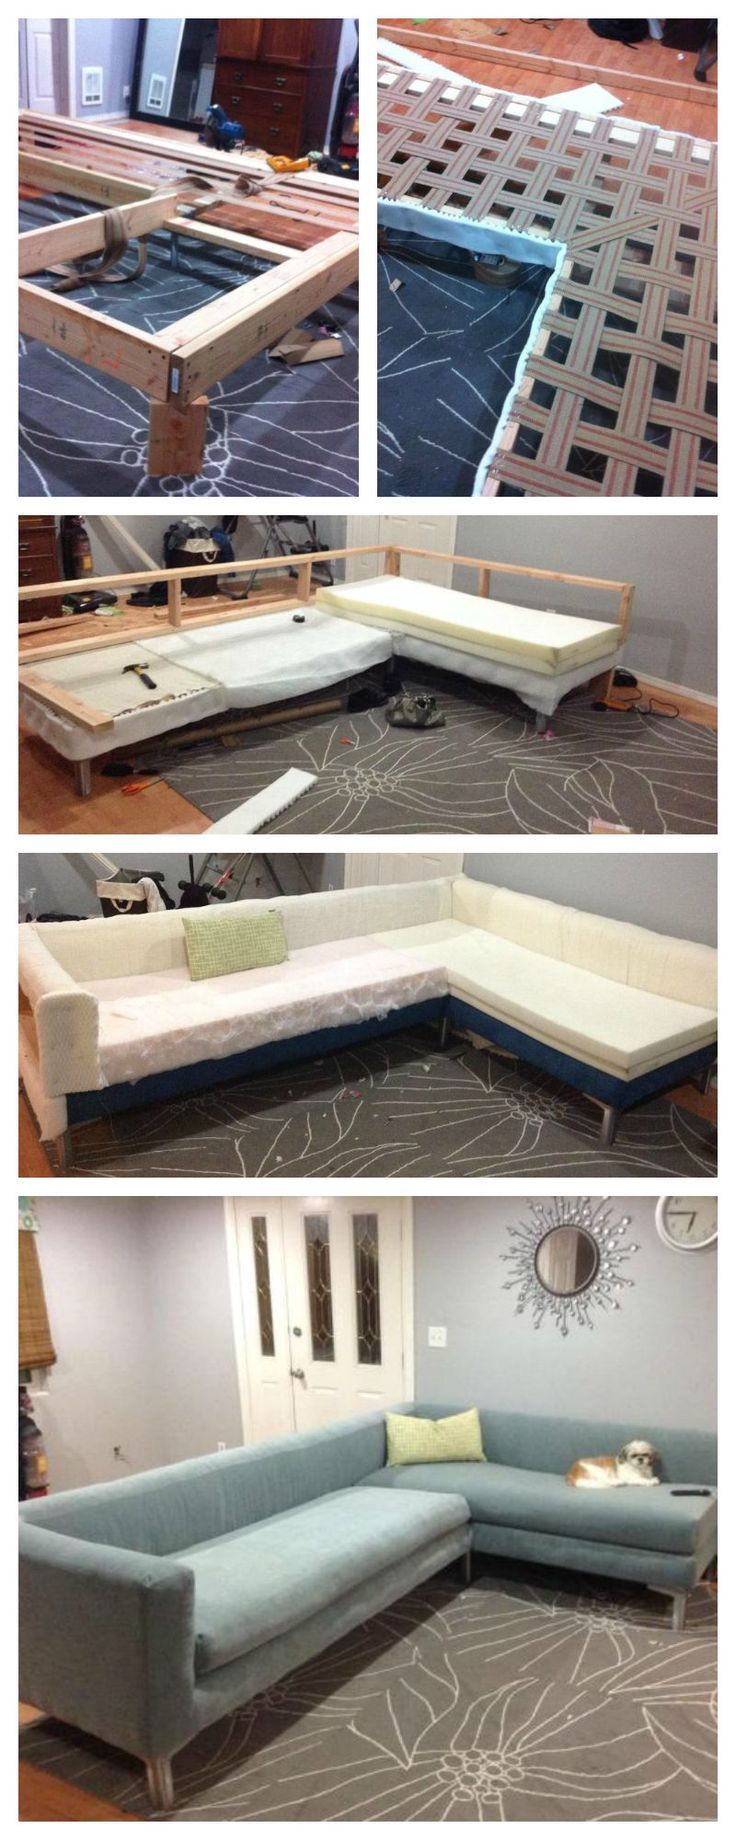 Modern Sectional Sofa Build Your Own Sofa Diy Couch Diy Sofa